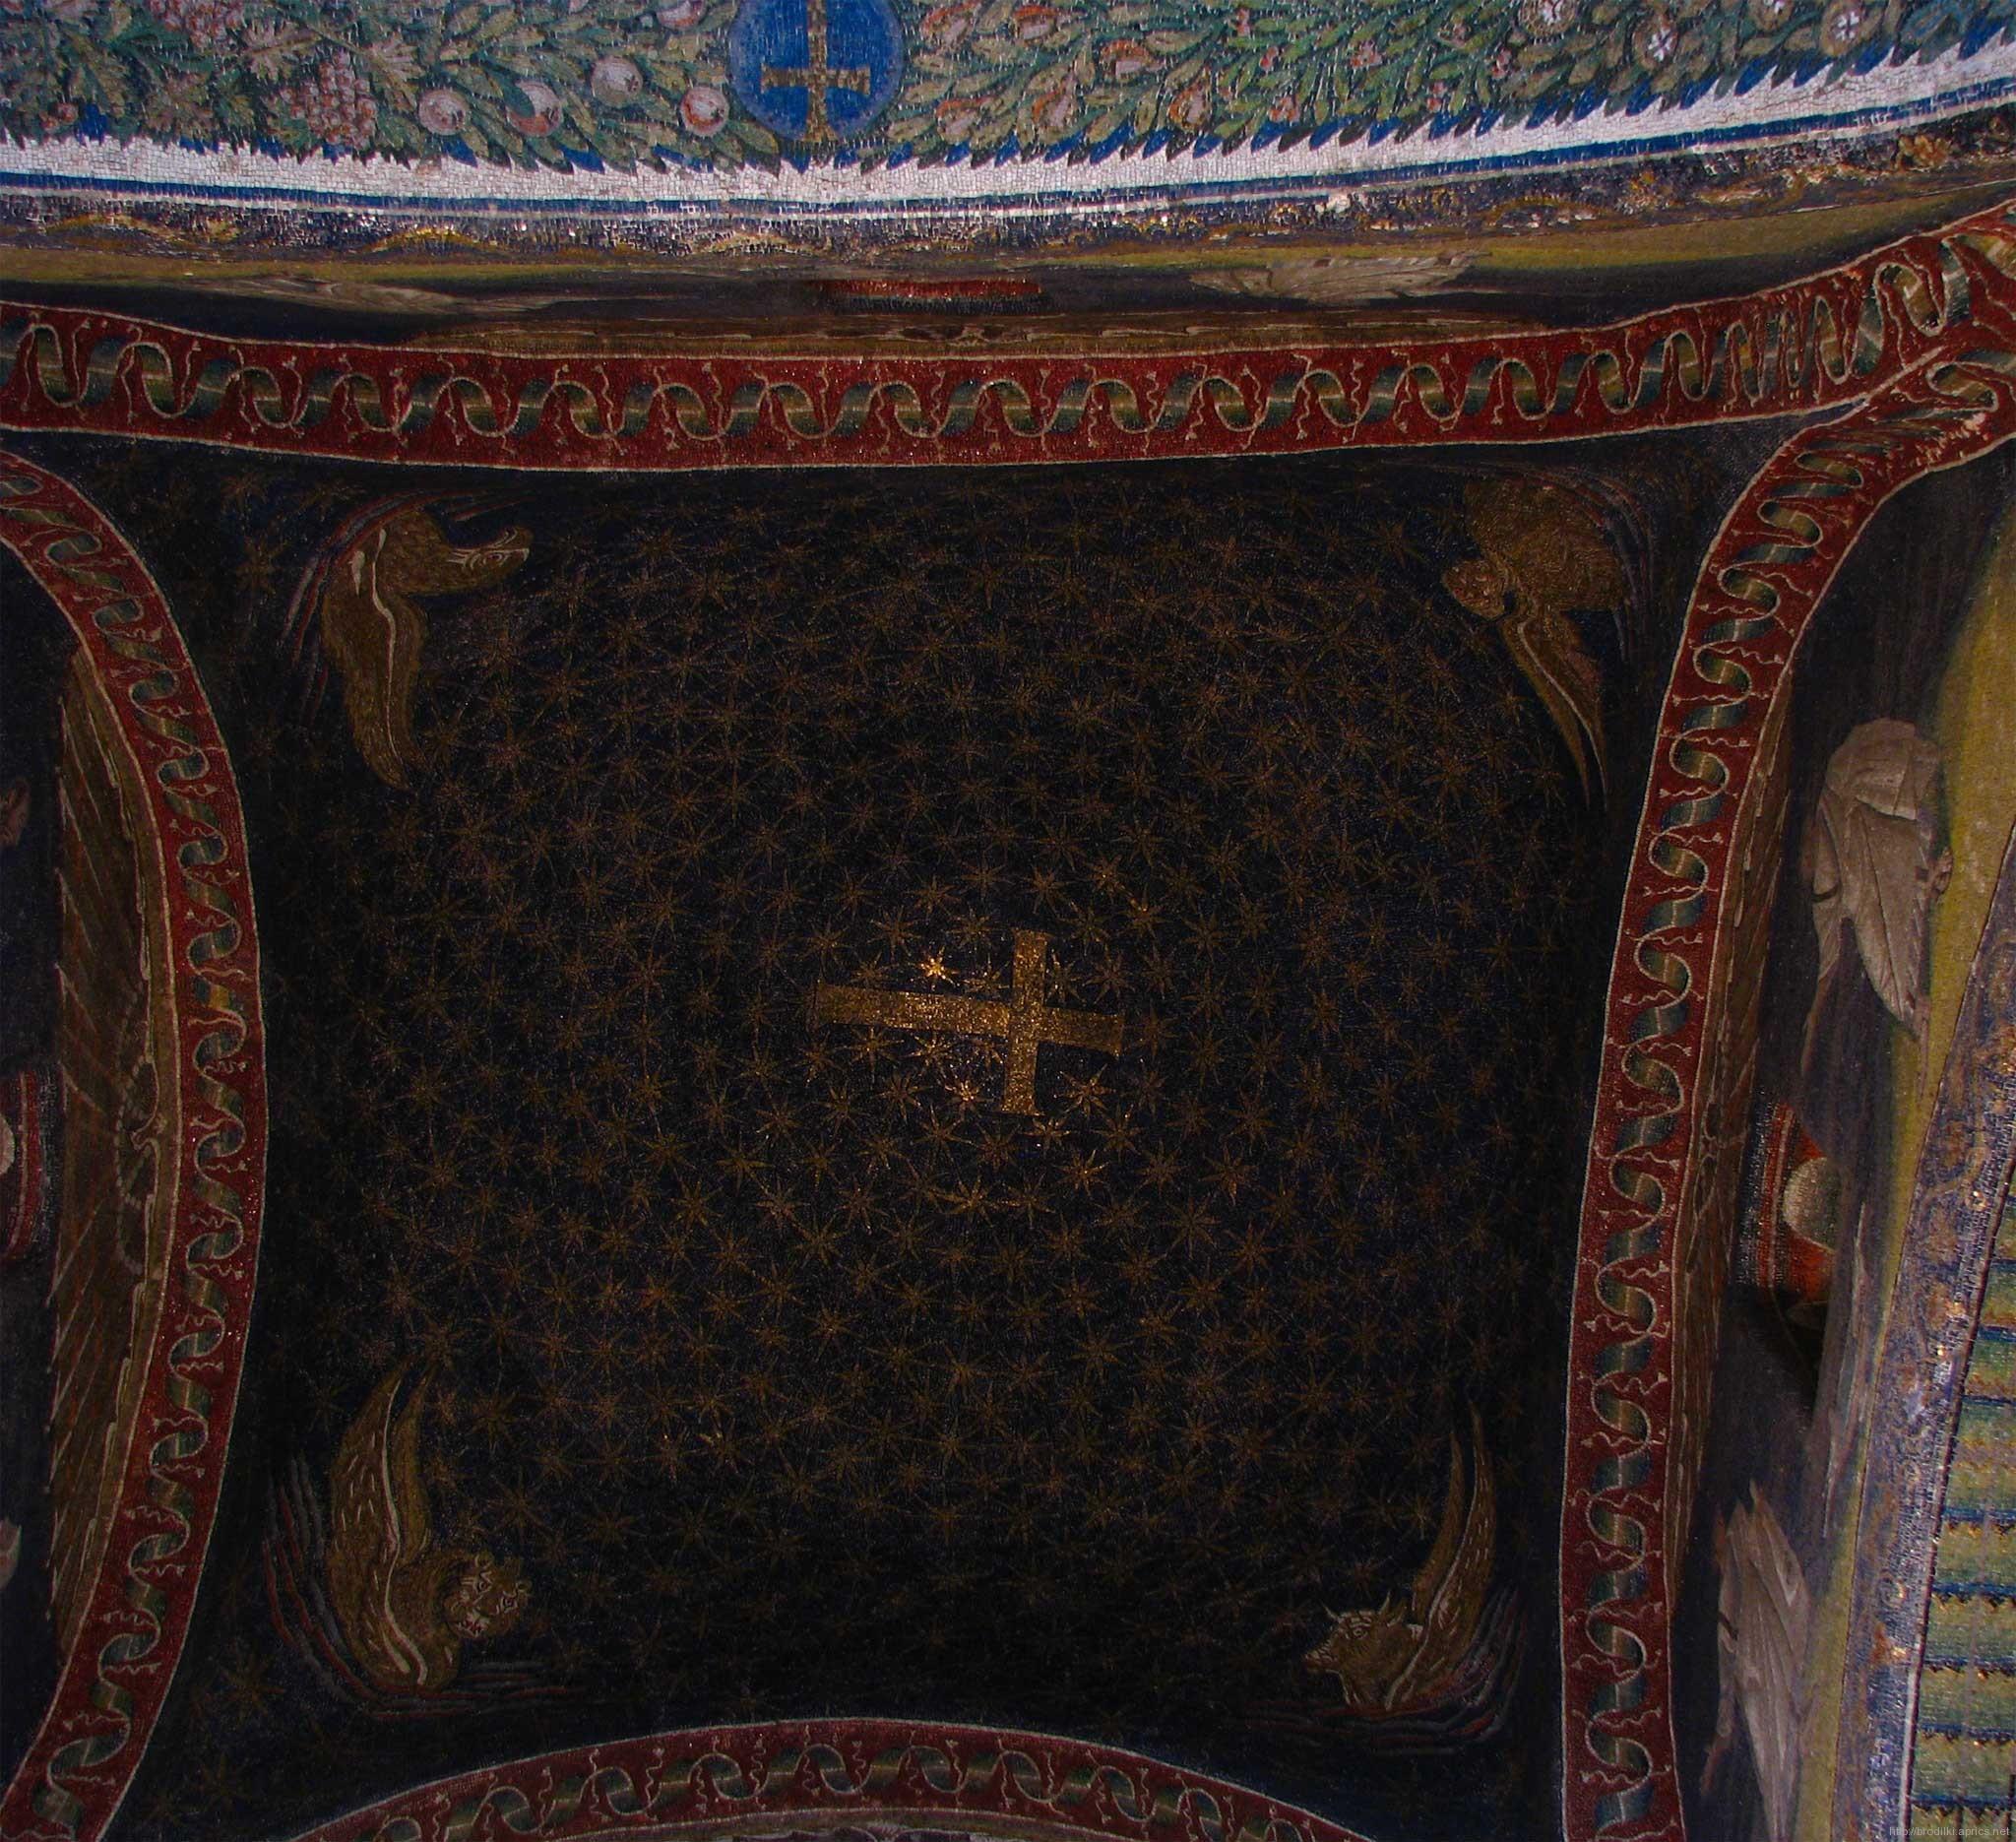 Мавзолей Галлы Плацидии, Равенна